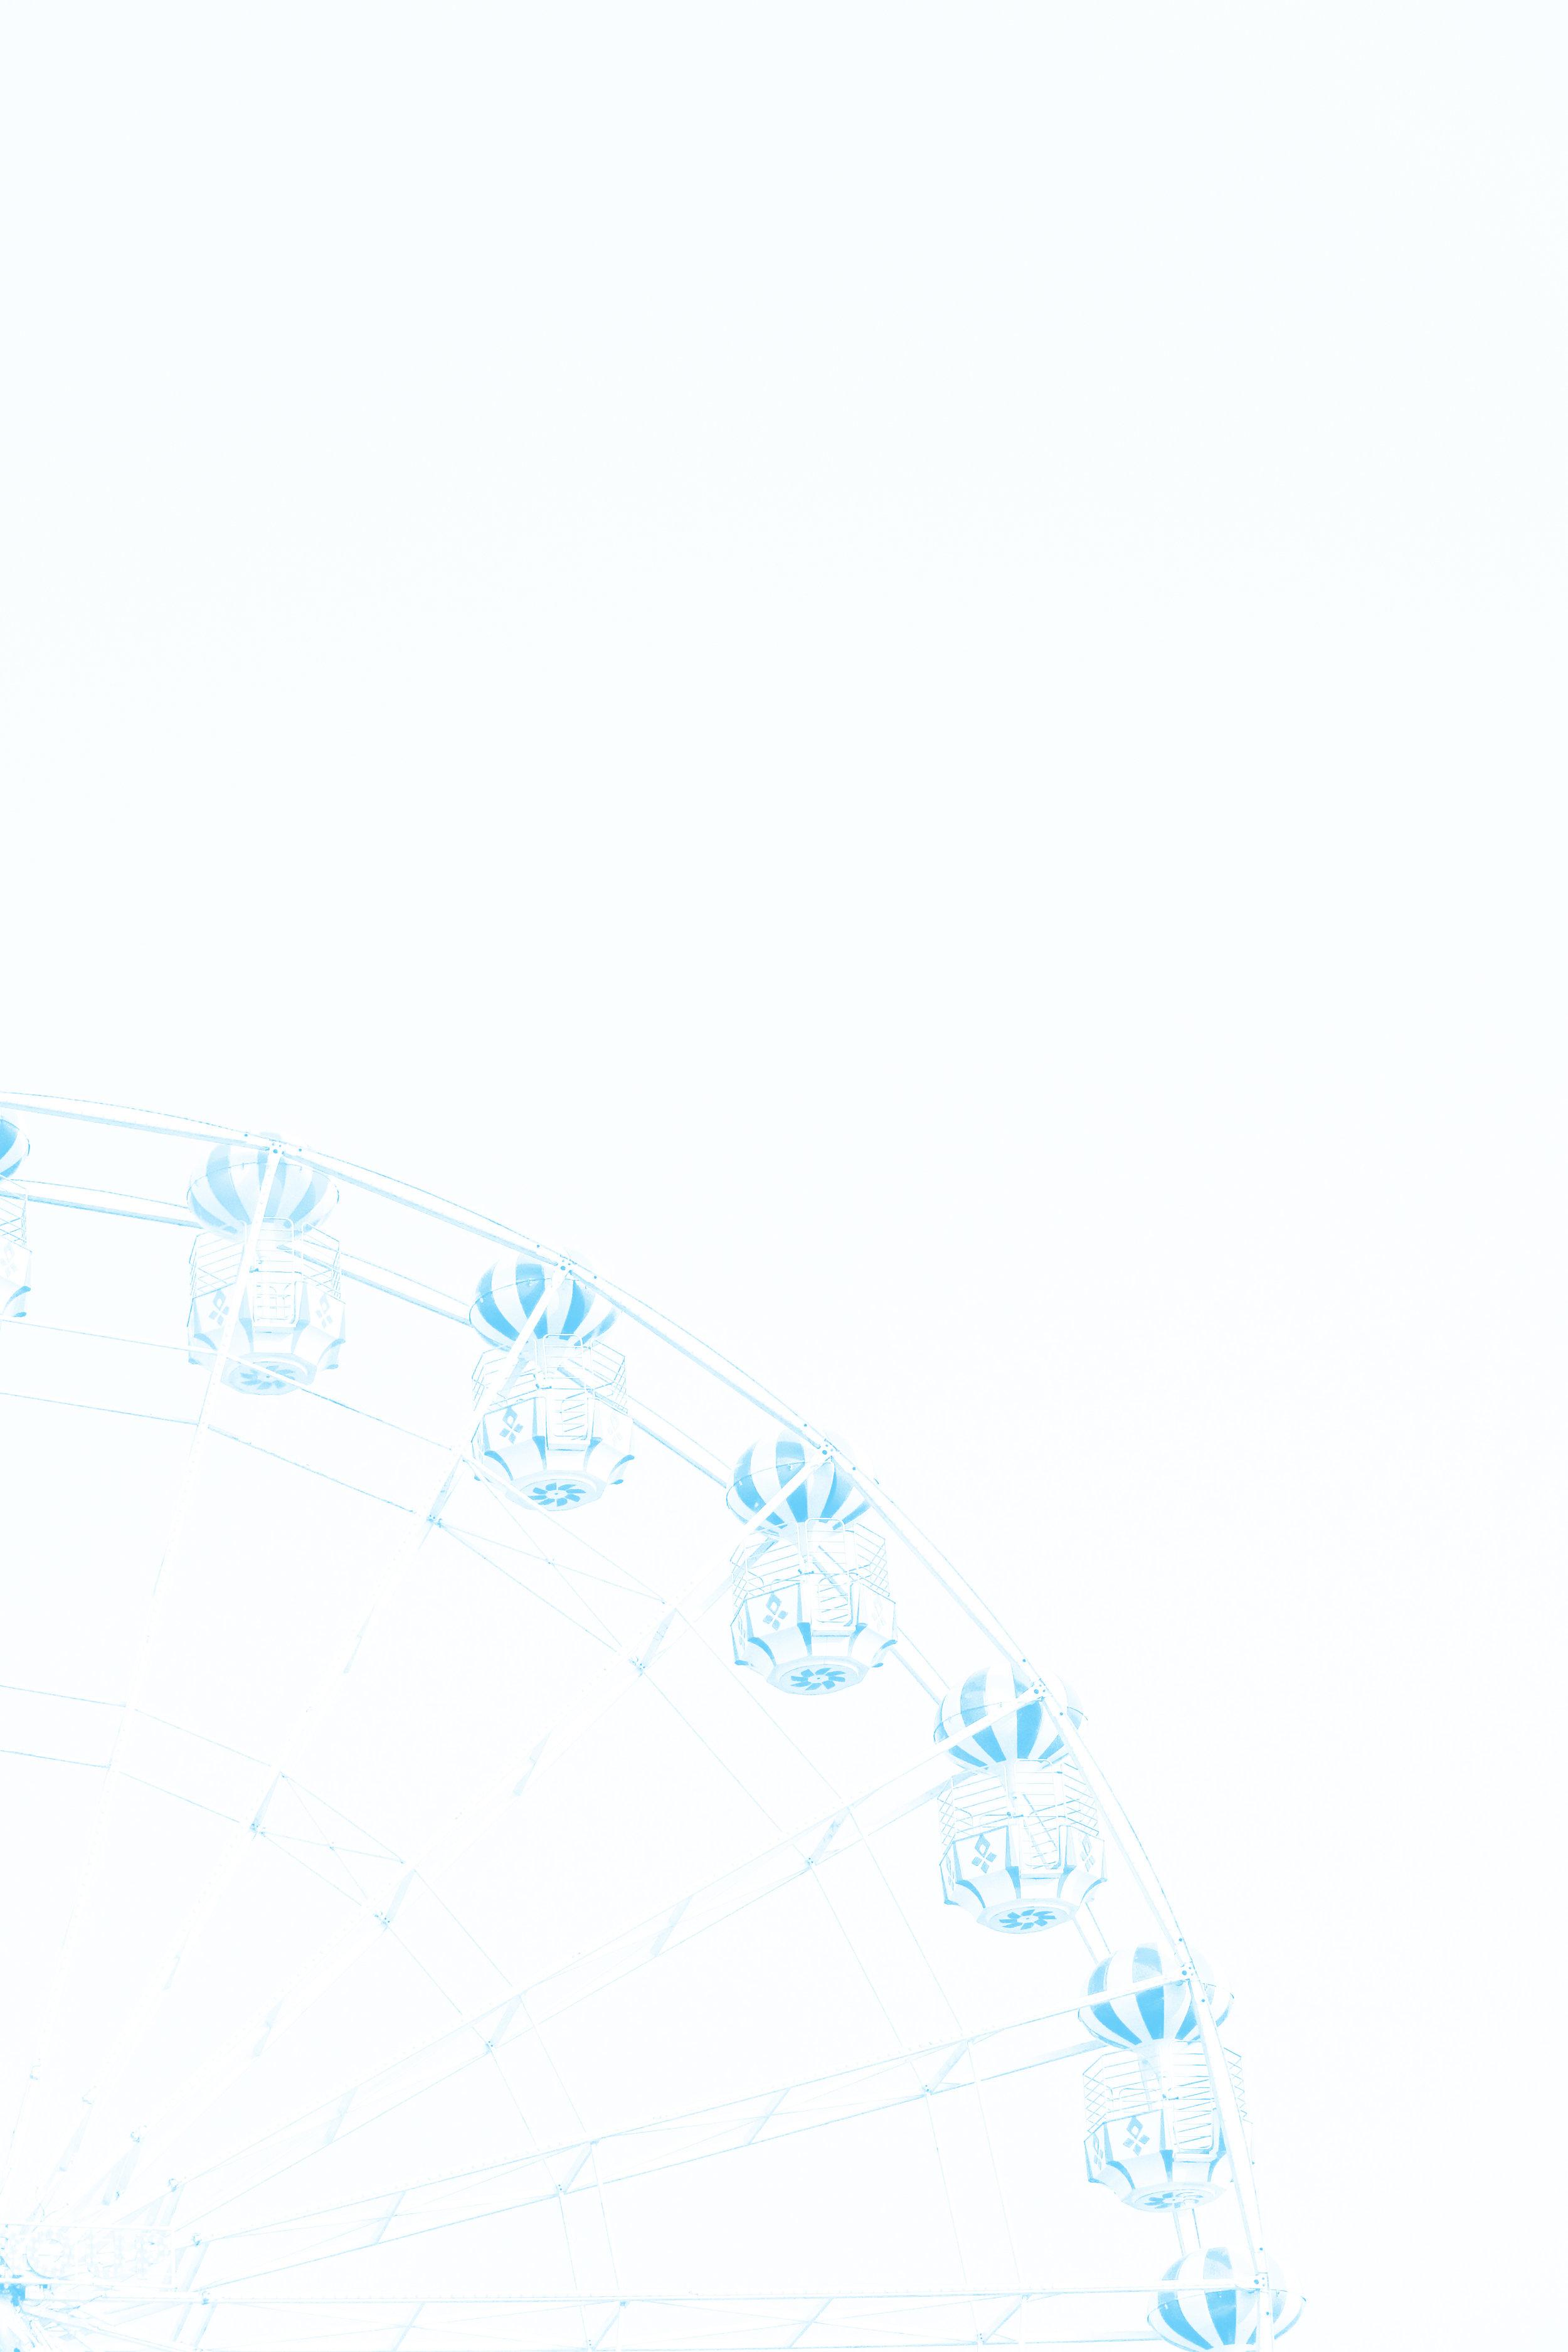 bluewhiteferriswheel.jpg